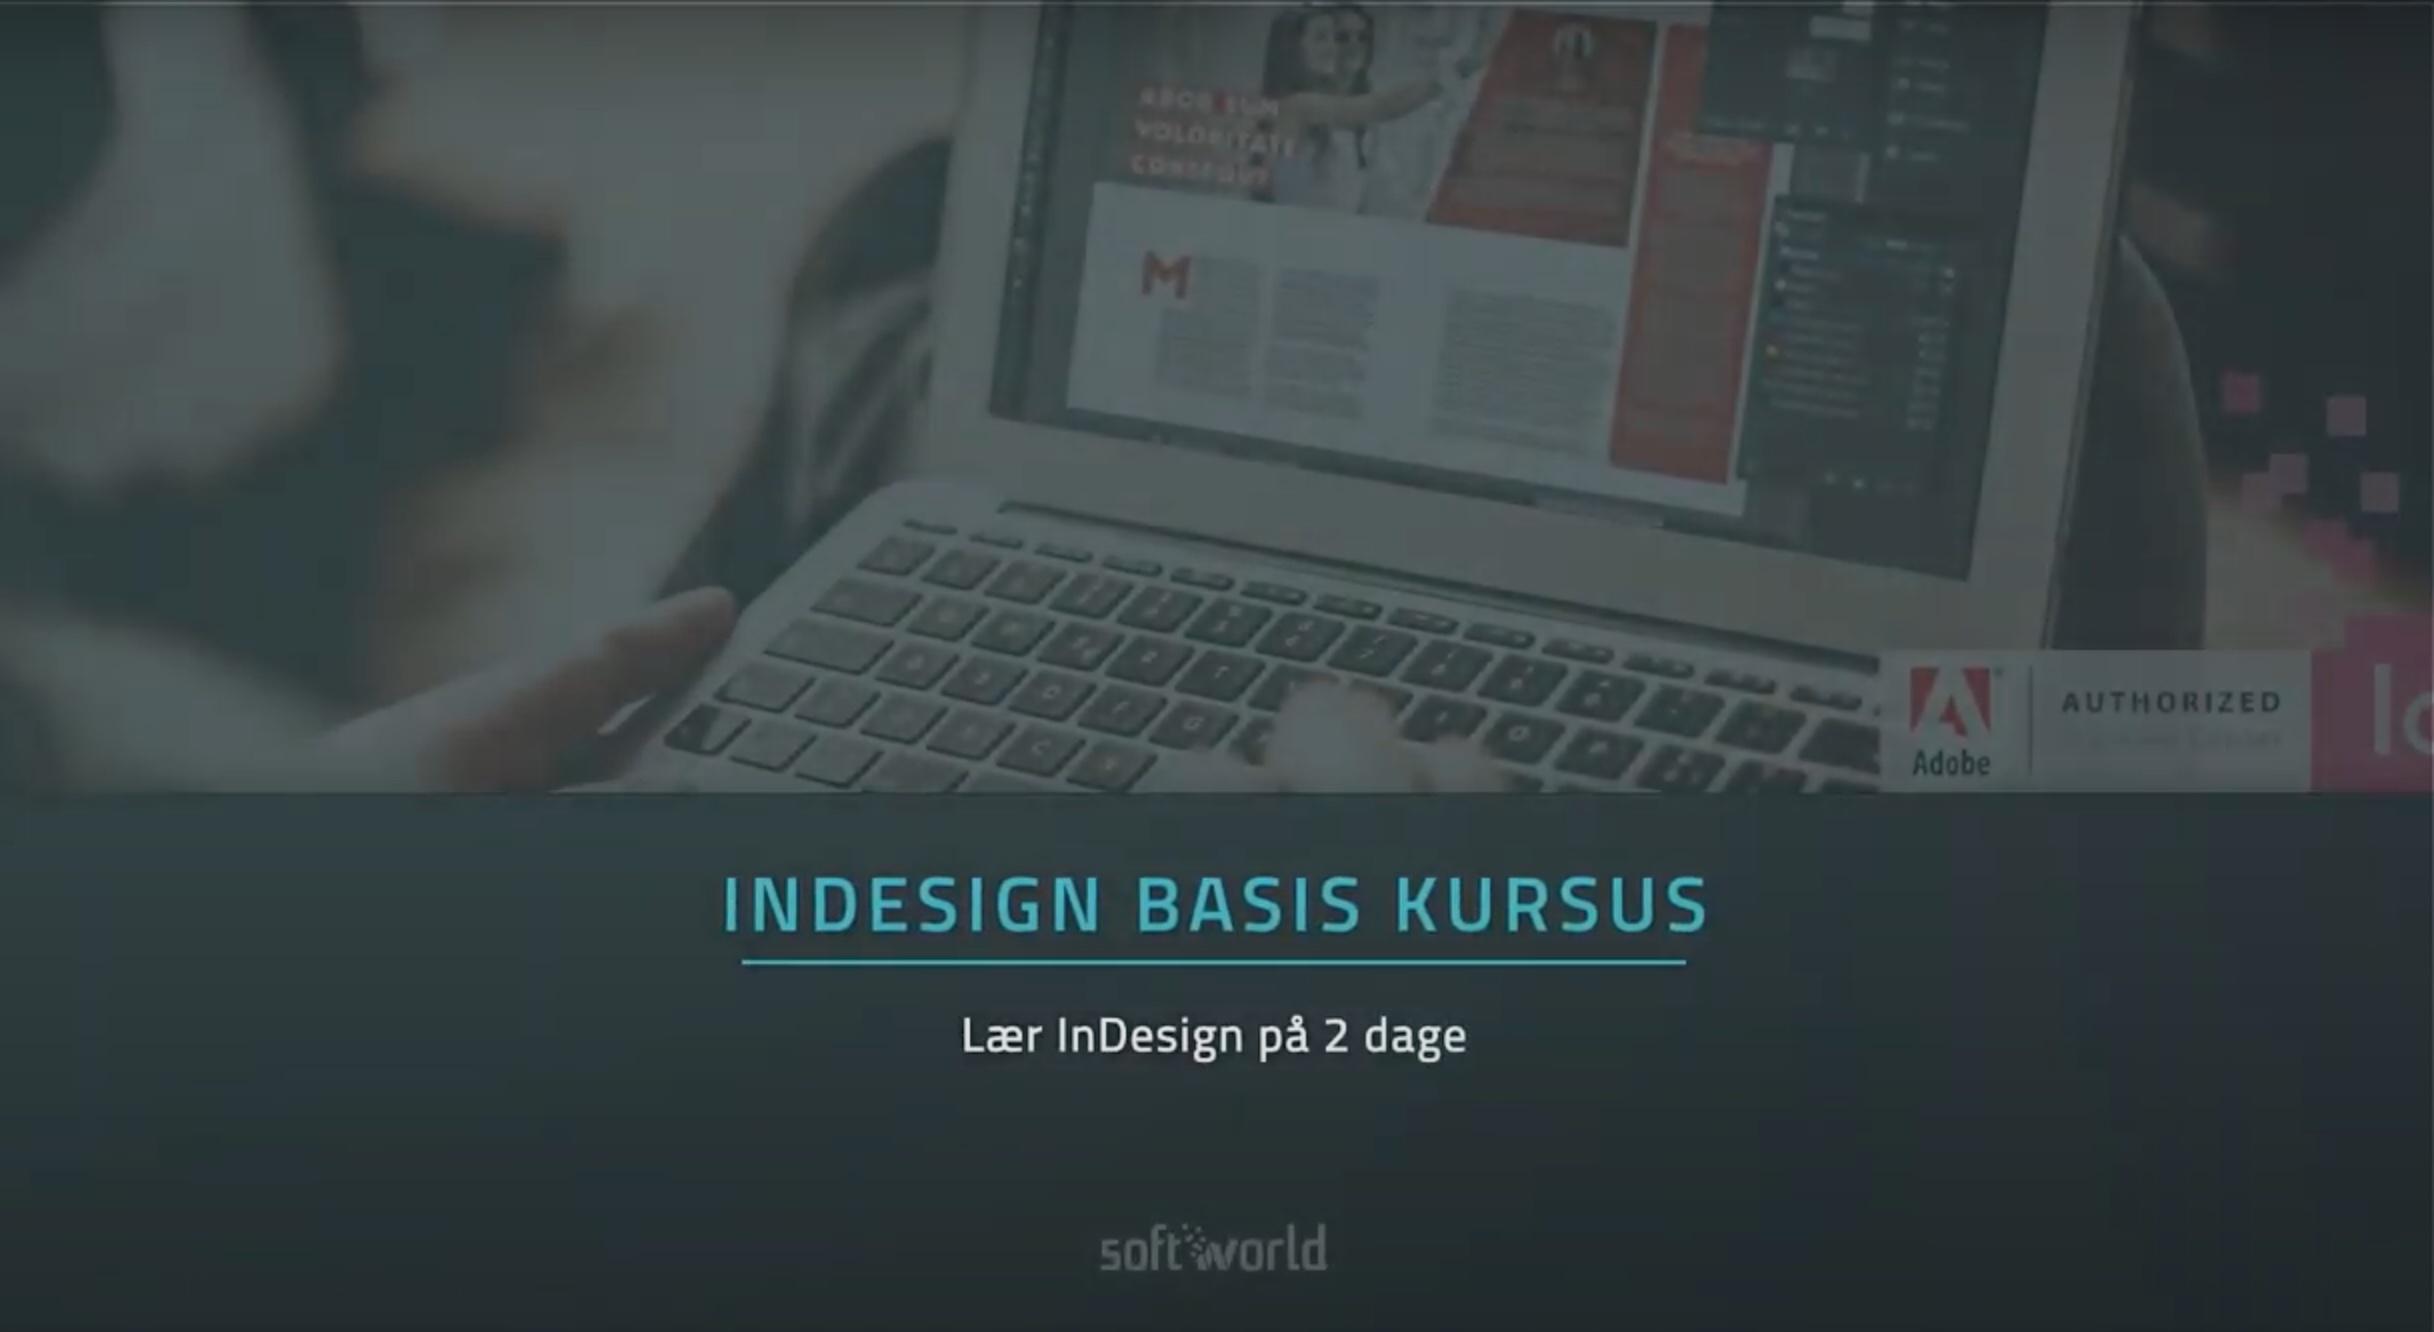 indesign kursus se video